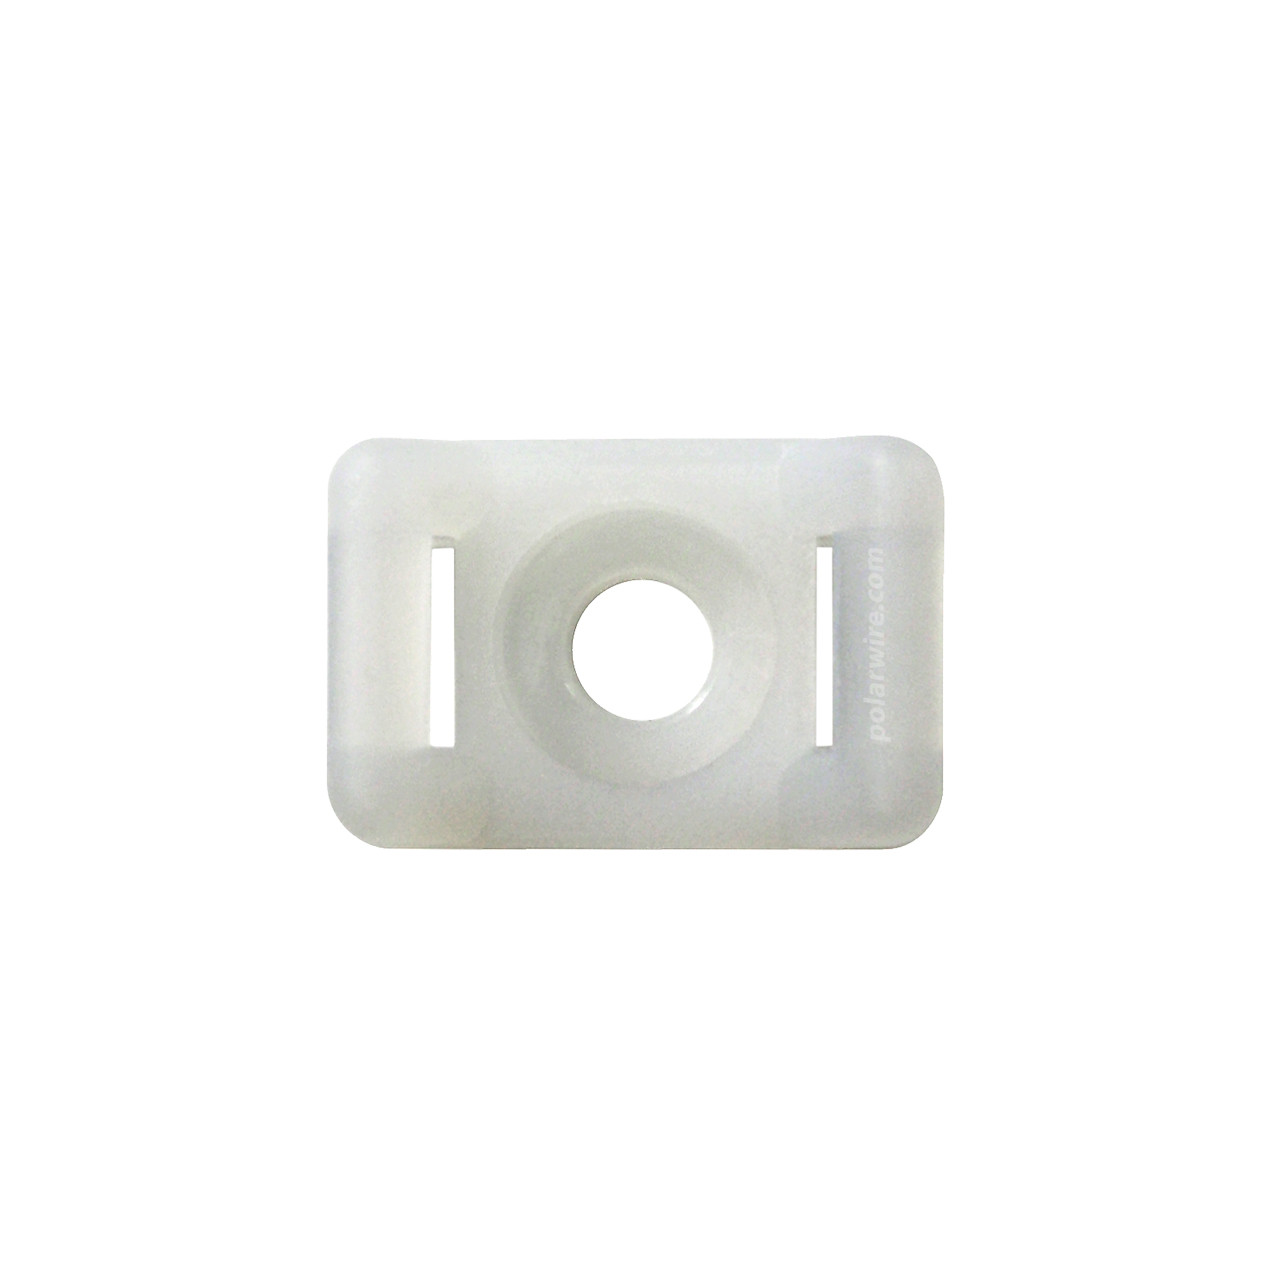 5/8 inch white nylon 6.6 zip tie base saddle mount, screw applied, 18-120 pound pull strength